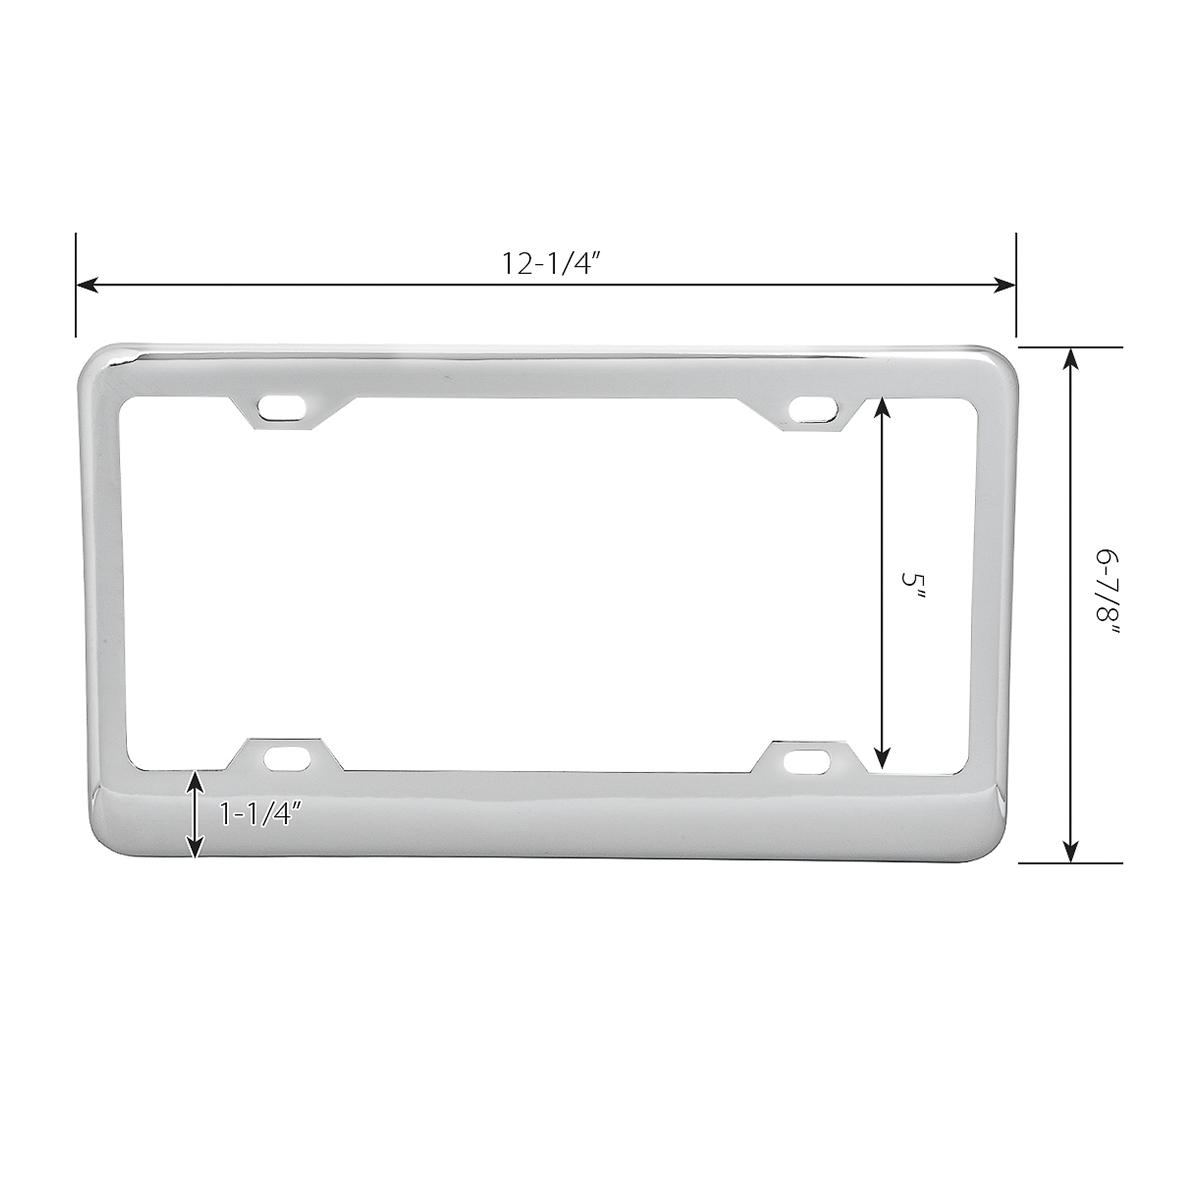 60050 Classic Chrome Plastic Steel 4-Hole License Plate Frames - Measurement